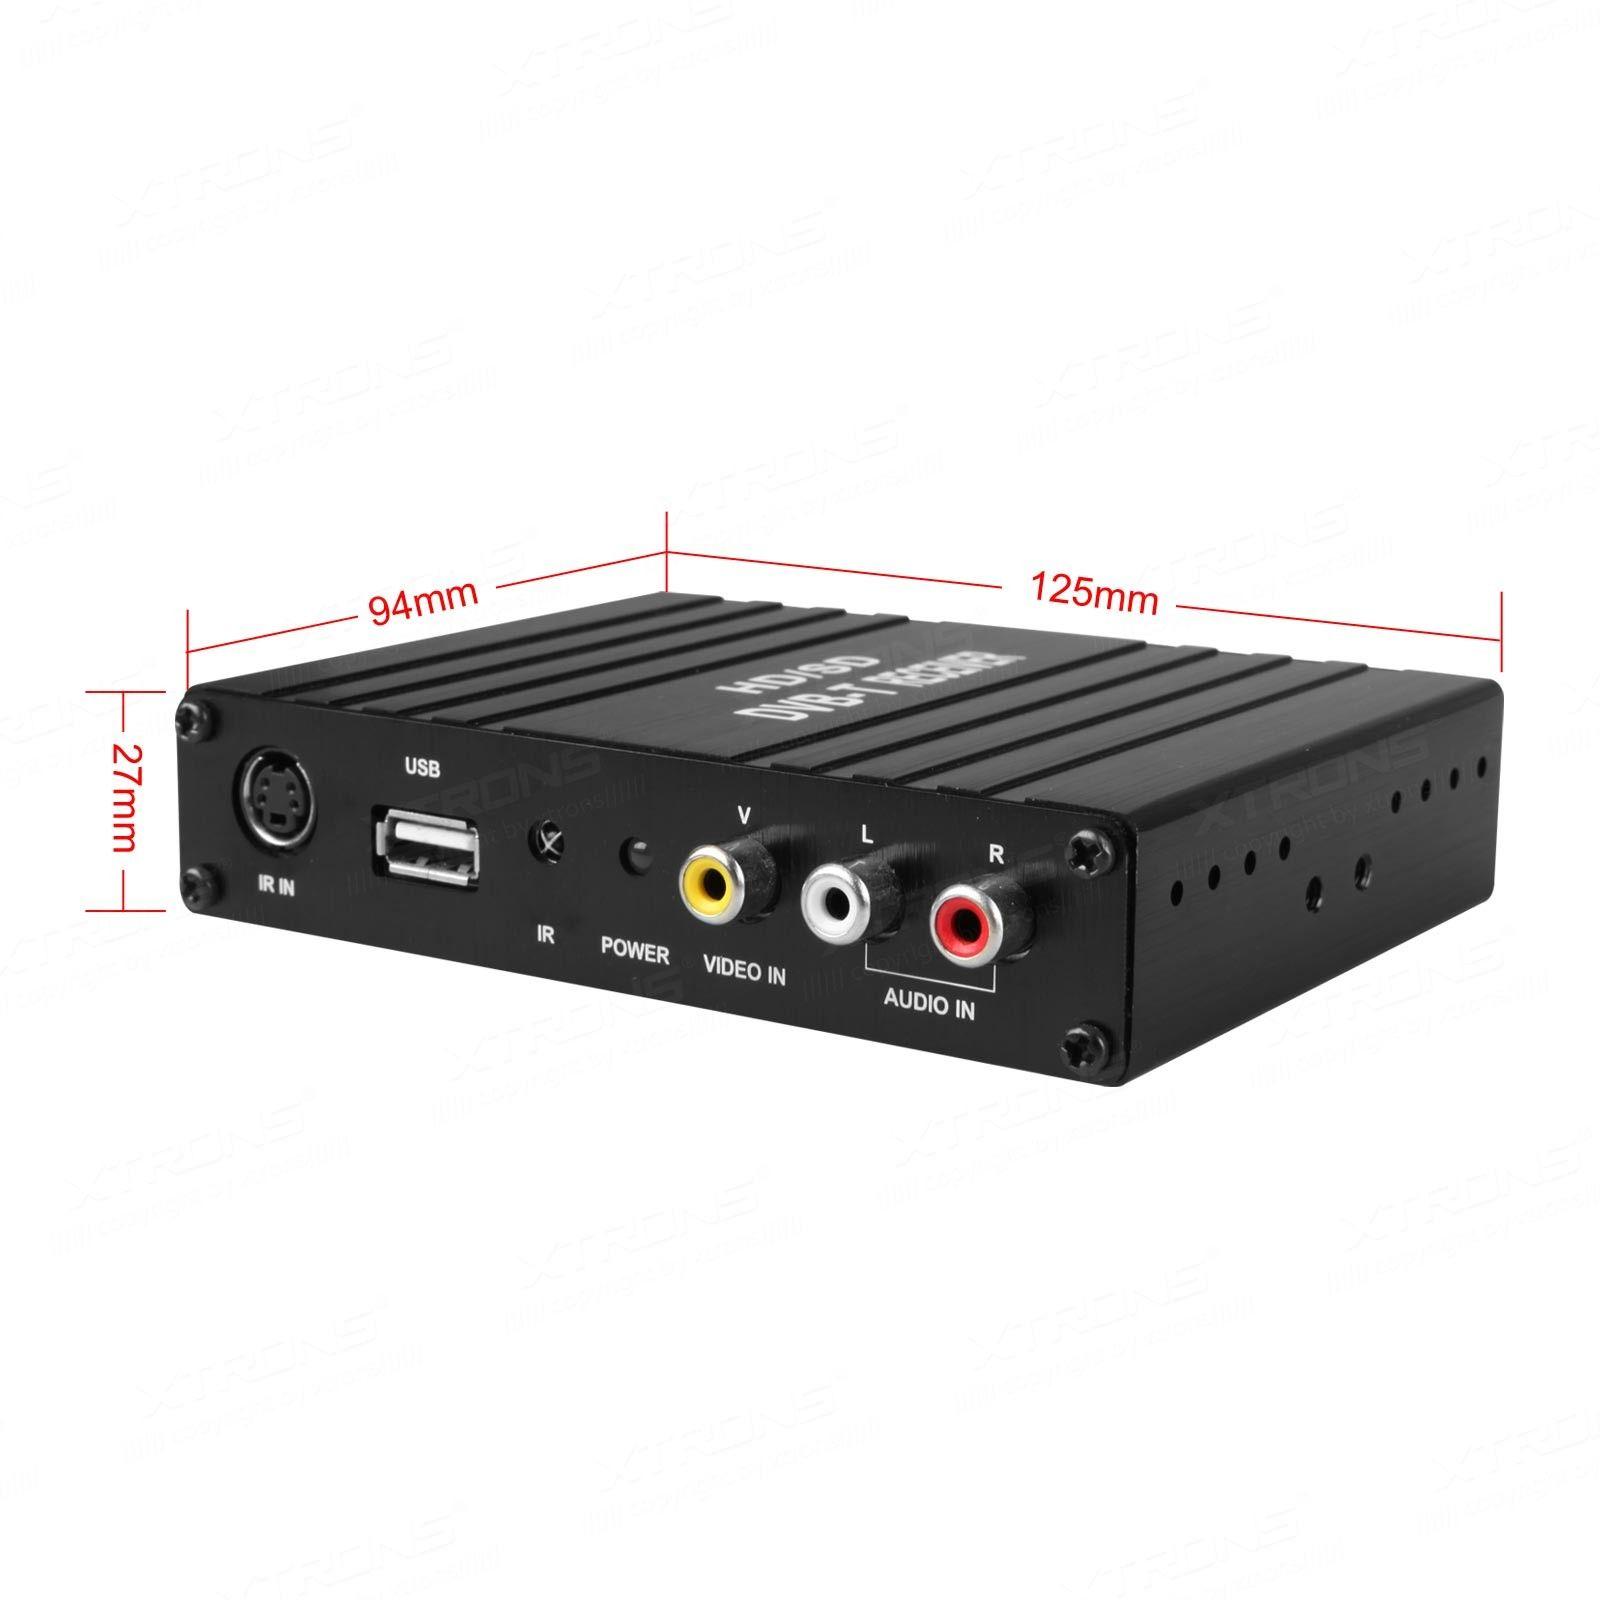 hd sd dvb t diversity freeview tv digital receiver for car mpeg 4 dual antenna. Black Bedroom Furniture Sets. Home Design Ideas